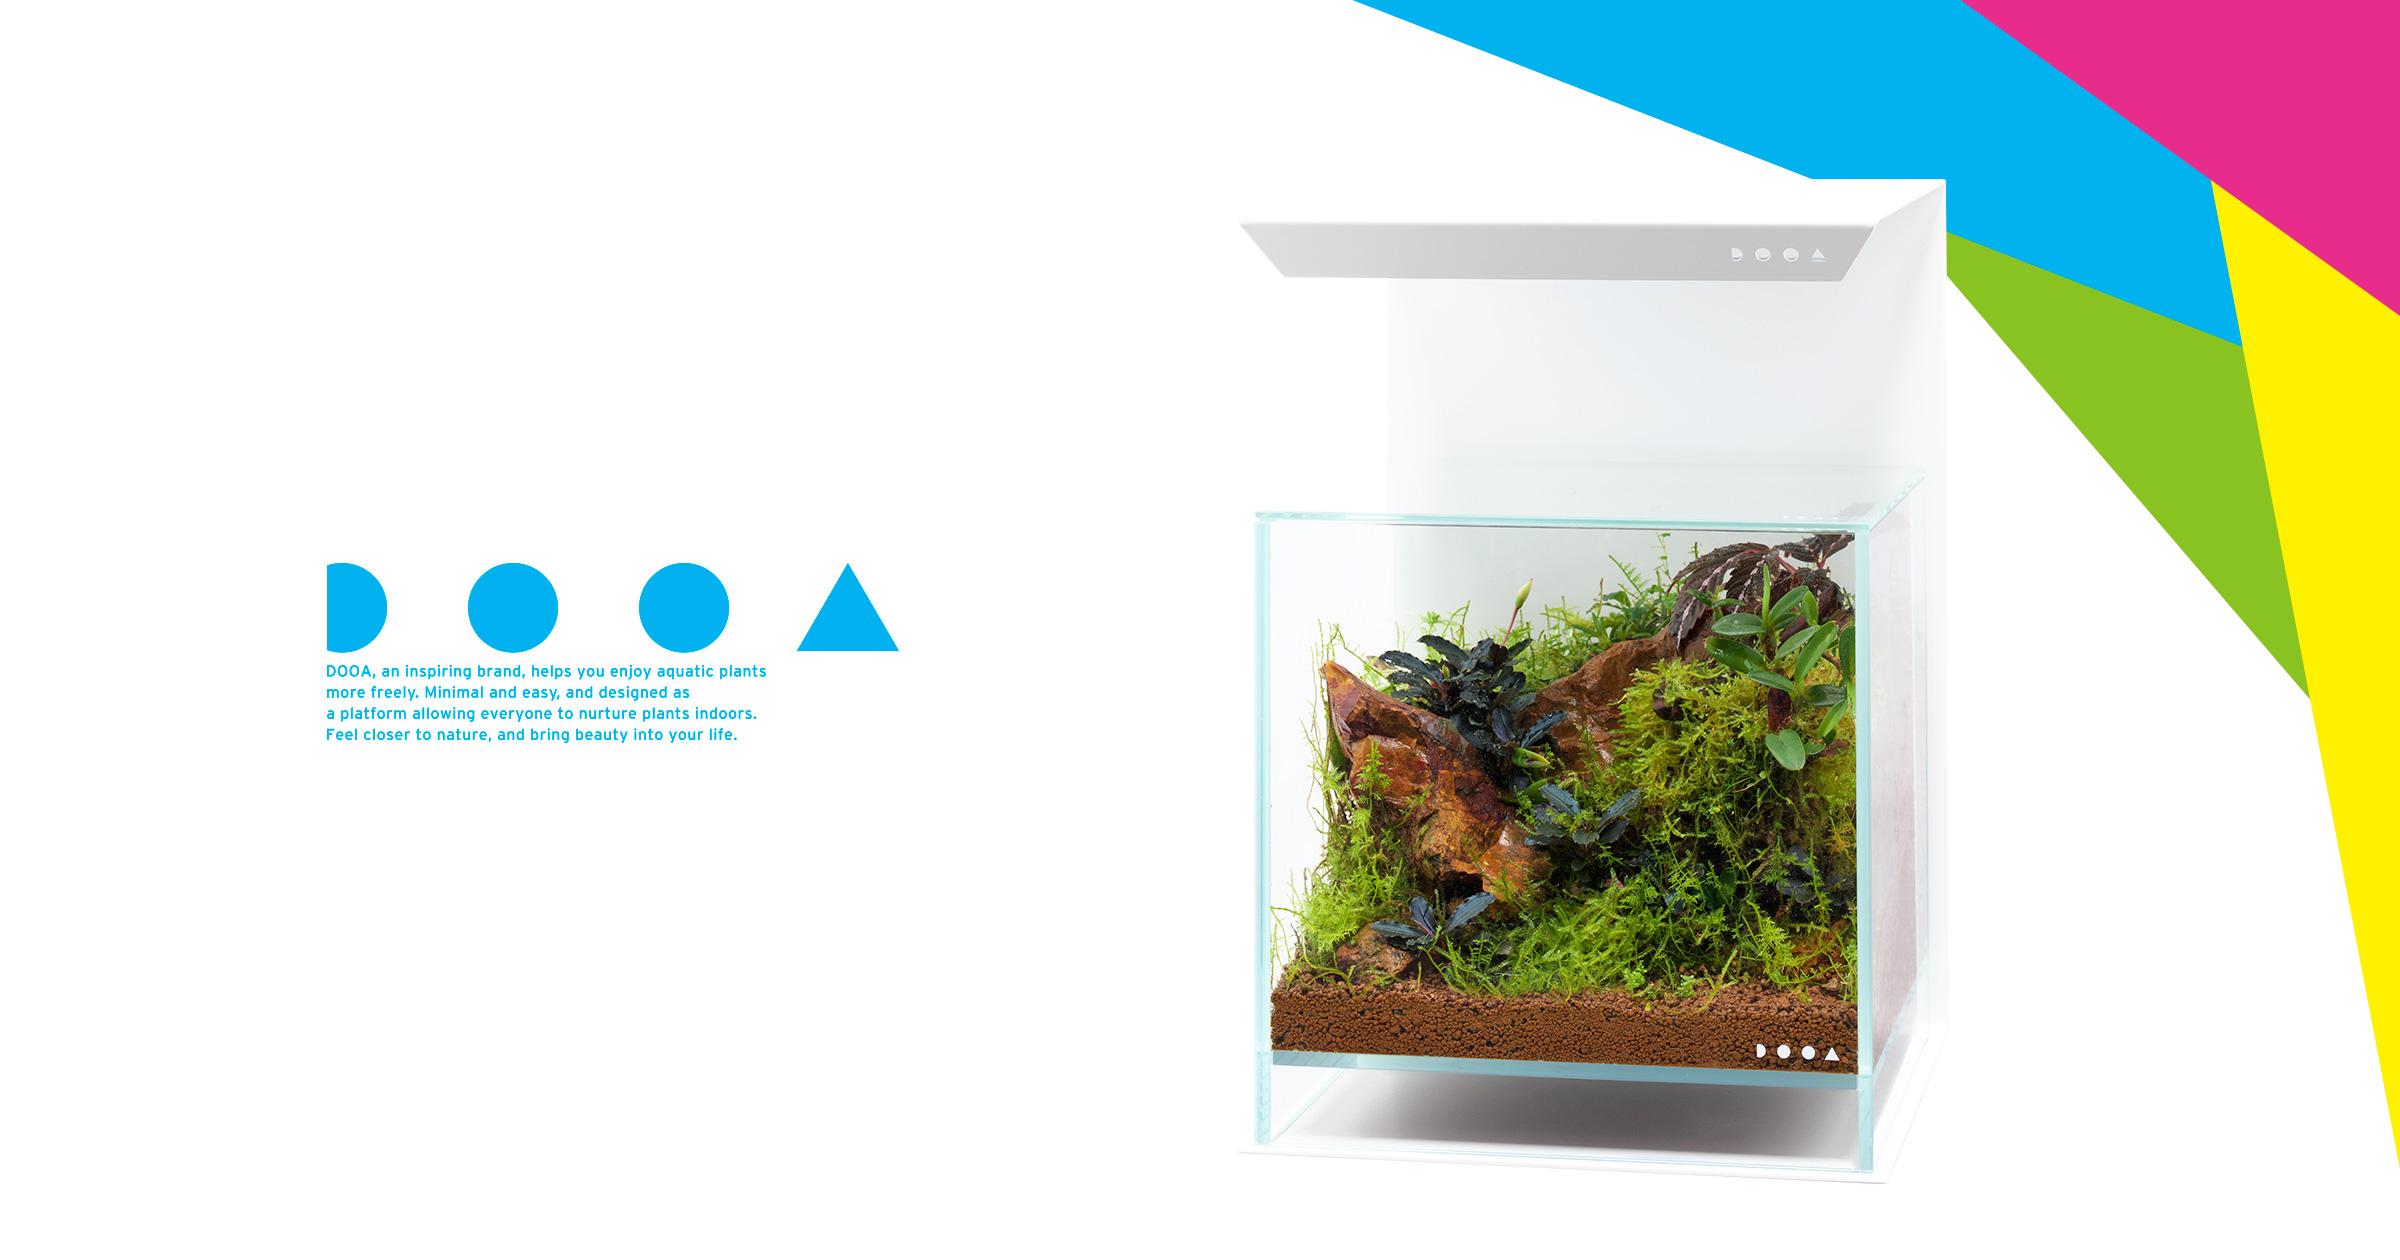 DOOA PALUDARIUM 'Imagine the Natural Habitat of Tropical Plants'